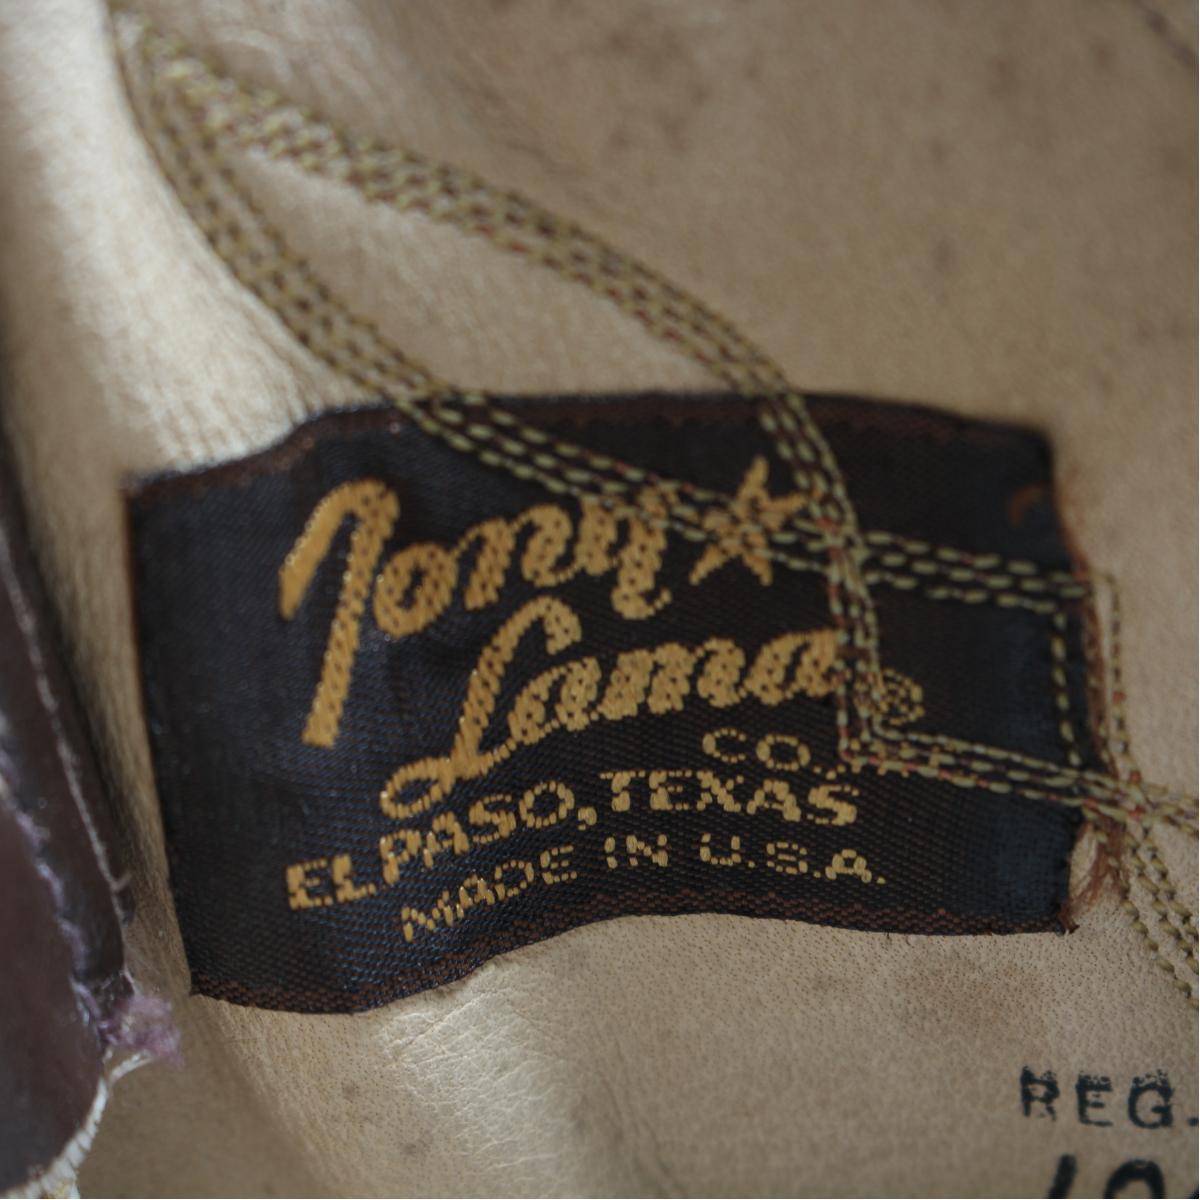 6190105e28a Tony llama Tony Lama gold label lizard leather western boots 8D men 26.5cm  vintage /bon6421